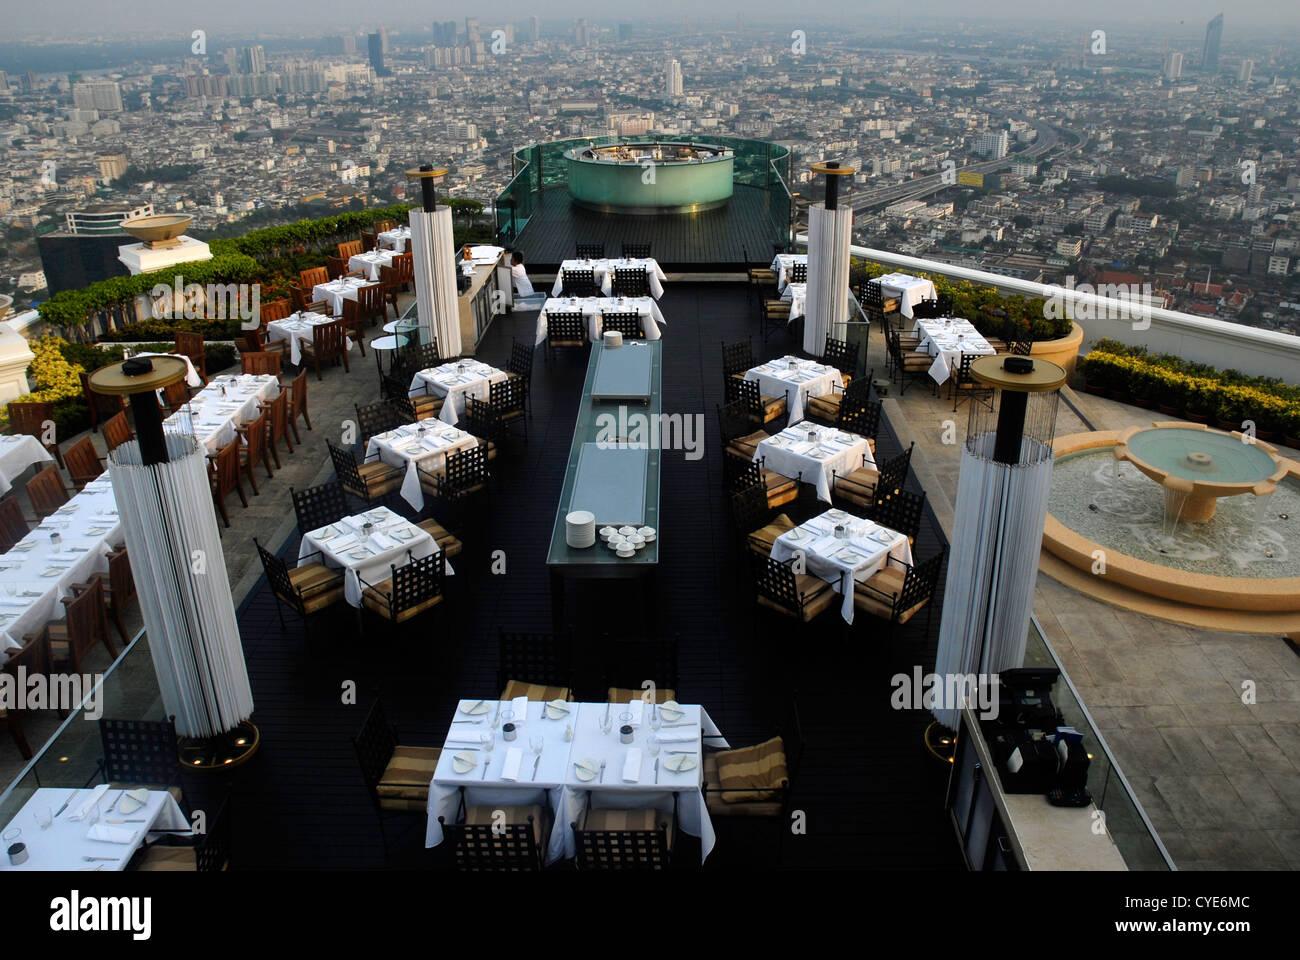 View, Panoramic, Nightlife, Restaurant, Sirocco, Bangkok, Sky Bar, Sight, Thailand, Asia - Stock Image